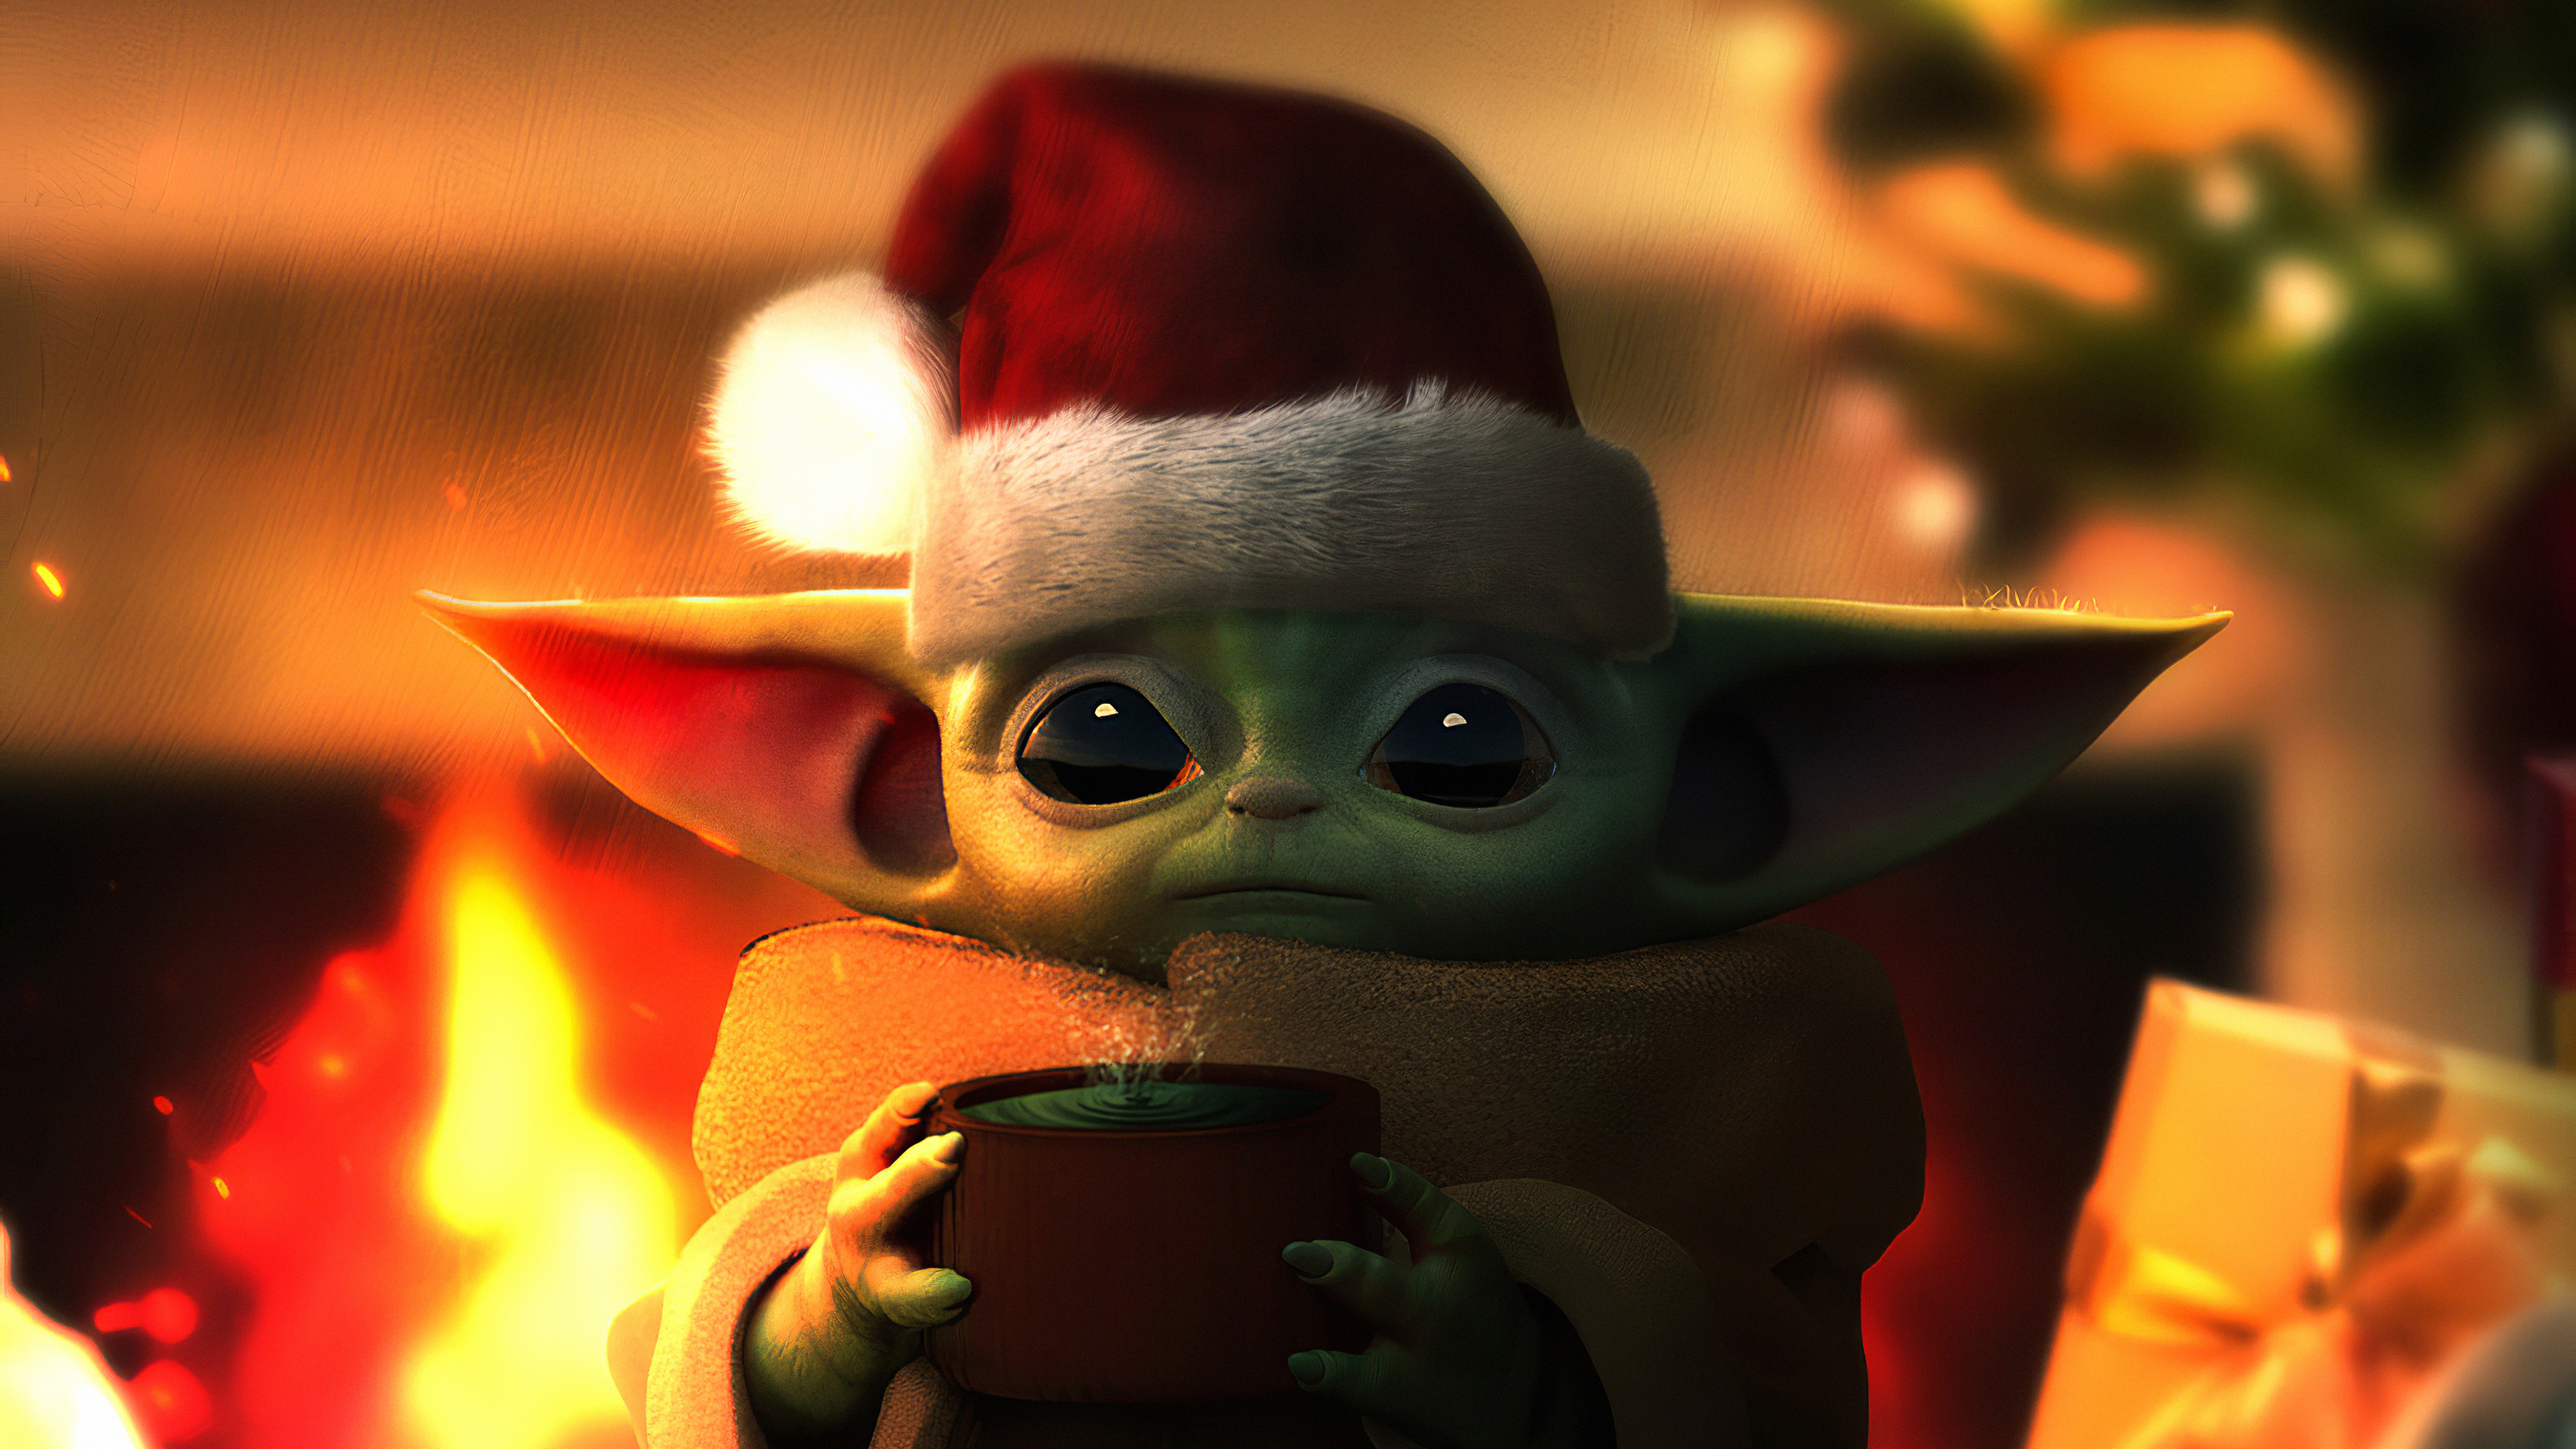 baby yoda christmas 1580056137 - Baby Yoda Christmas - Baby Yoda wallappers, Baby Yoda 4k wallpapers, Baby Yoda 2020 wallpapers